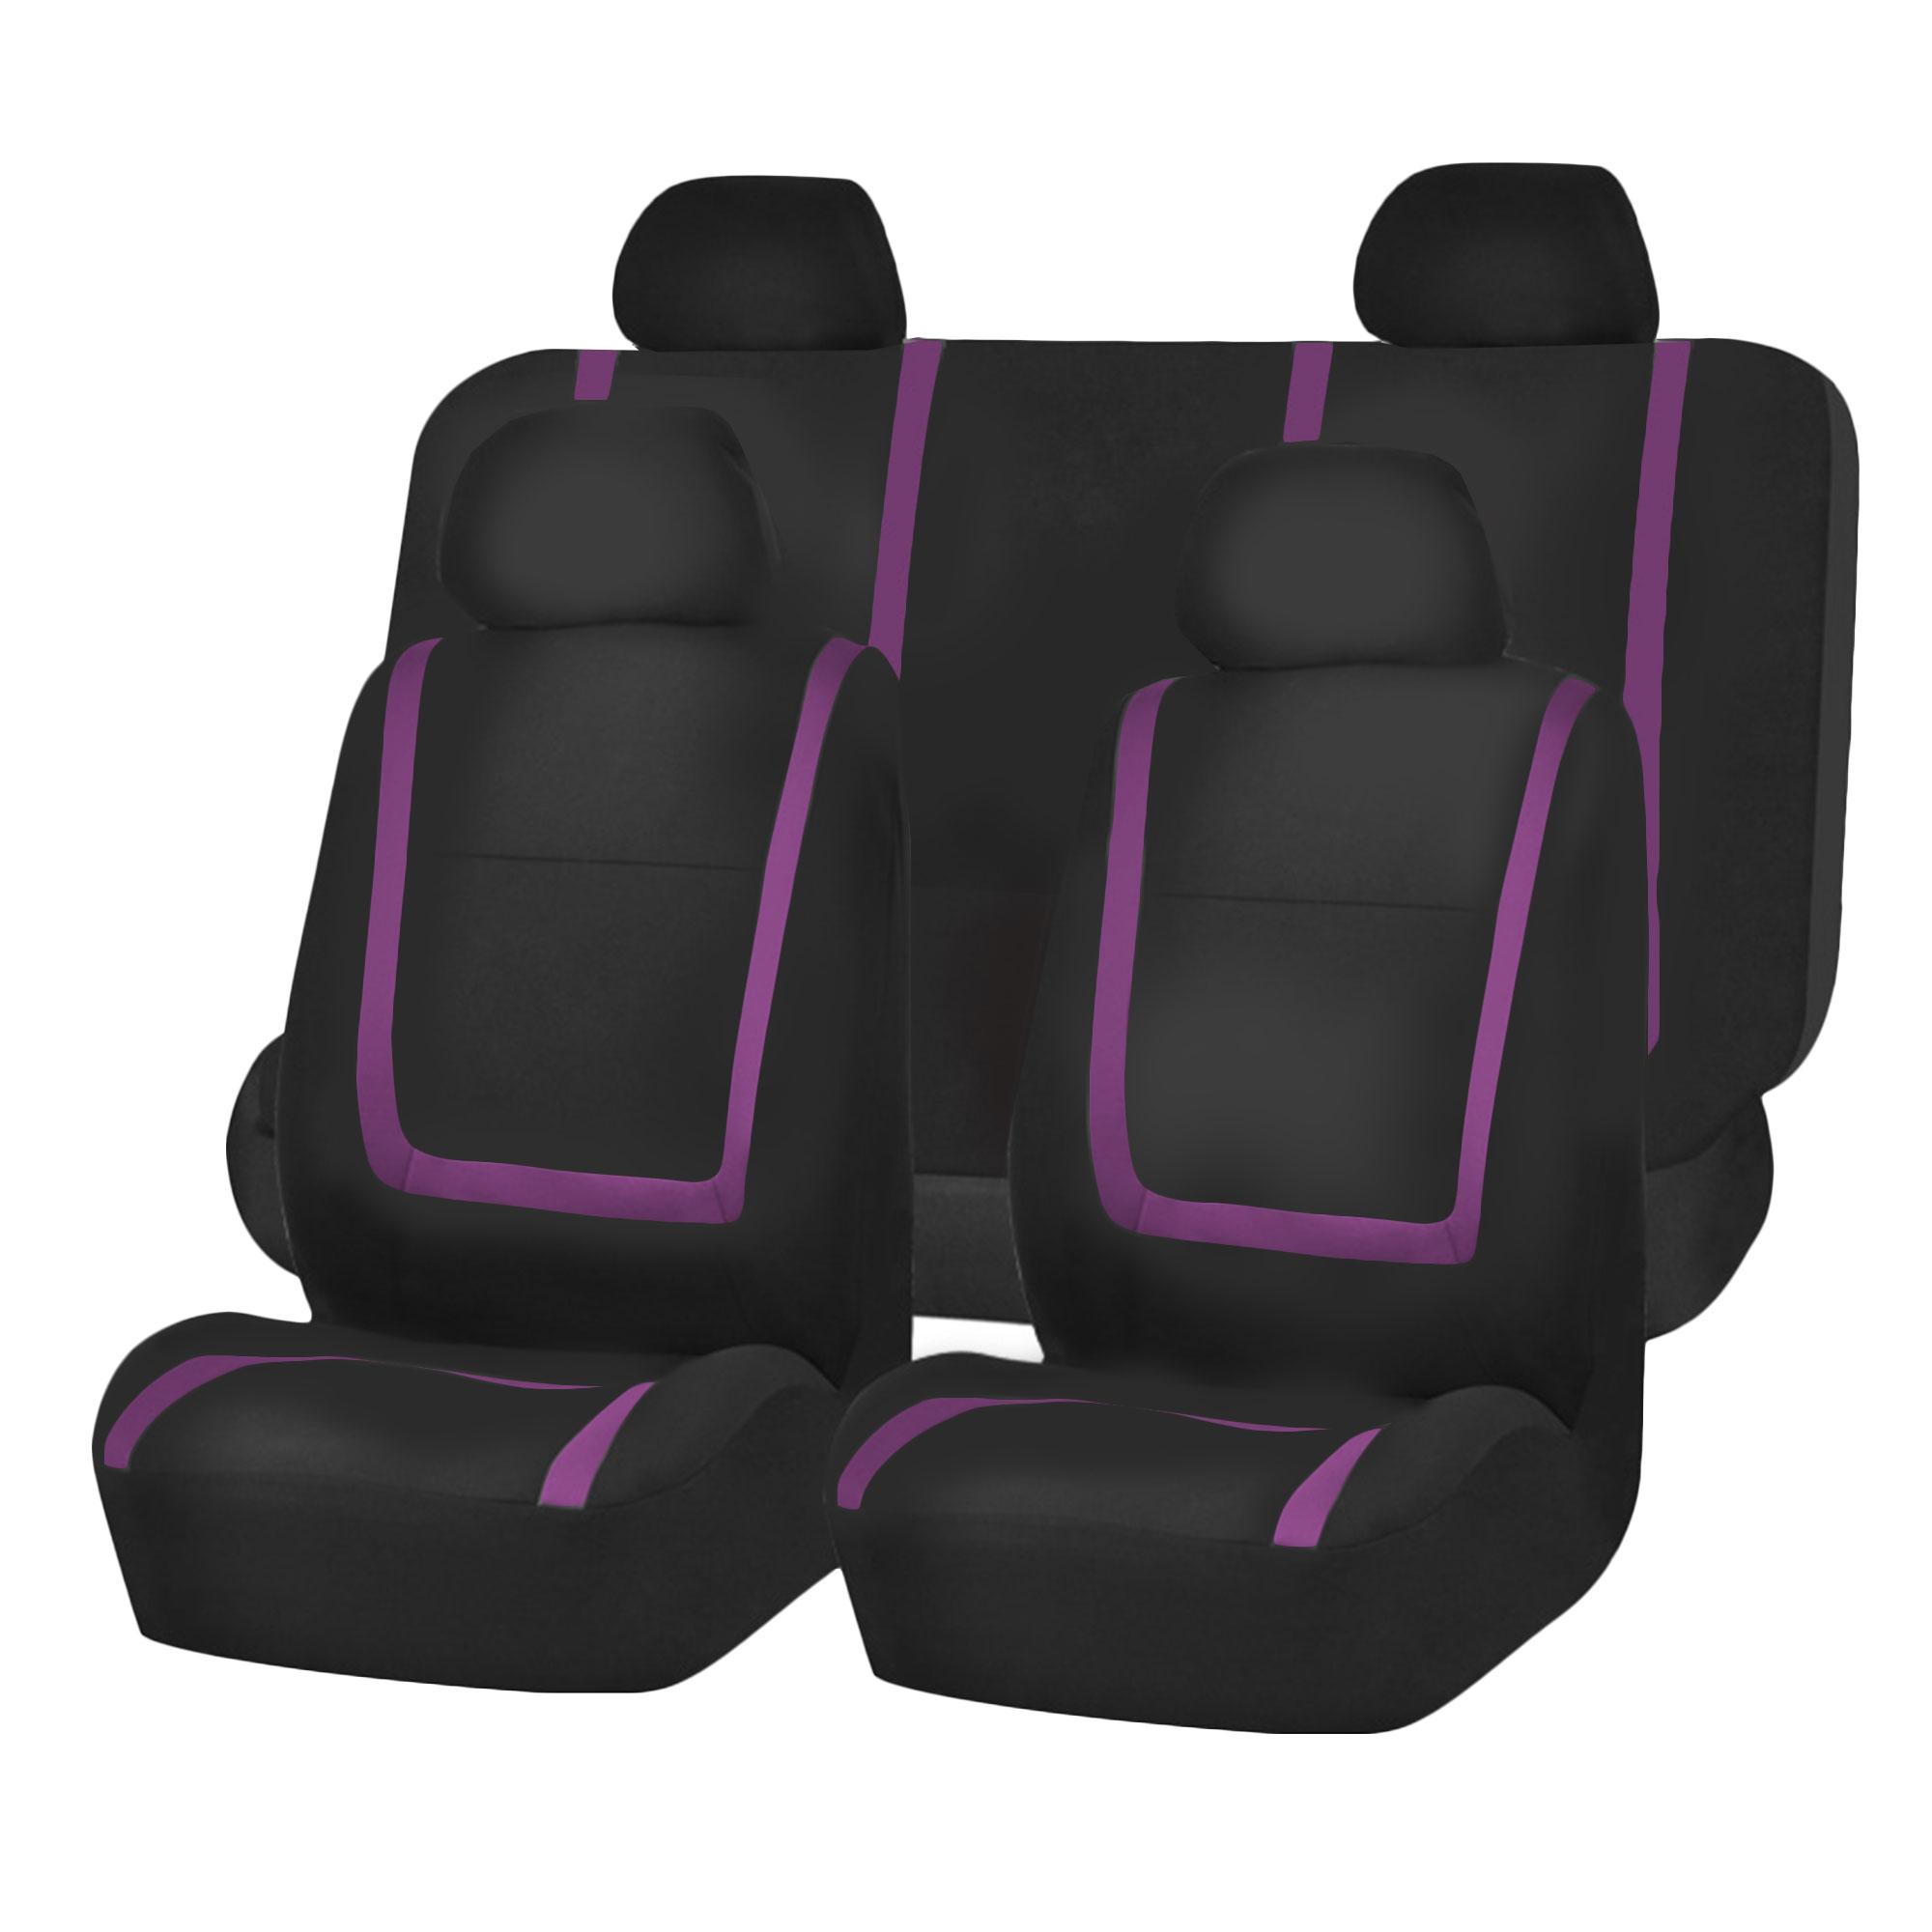 Car Seat Covers Purple Black Full Set For Auto W/Black